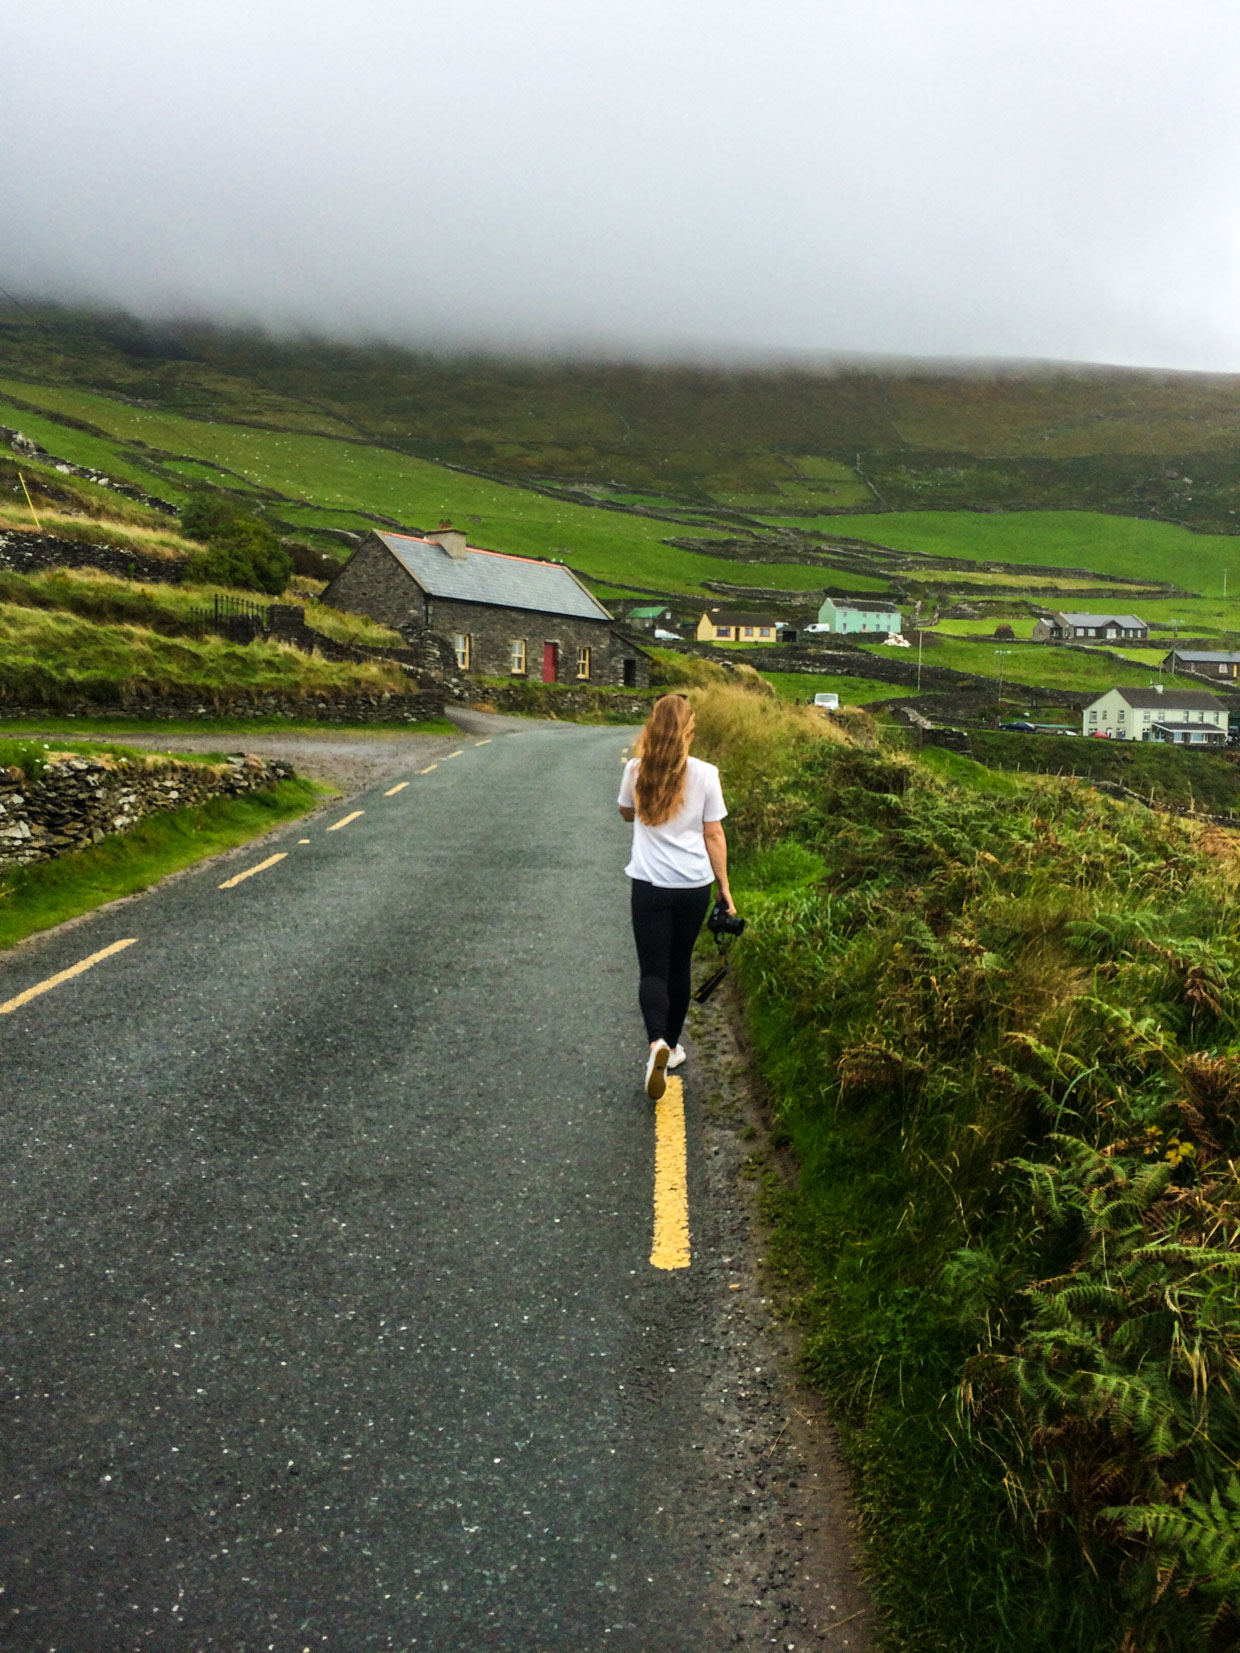 Female photographer exploring from Killarney to Dingle, County Kerry, Ireland.